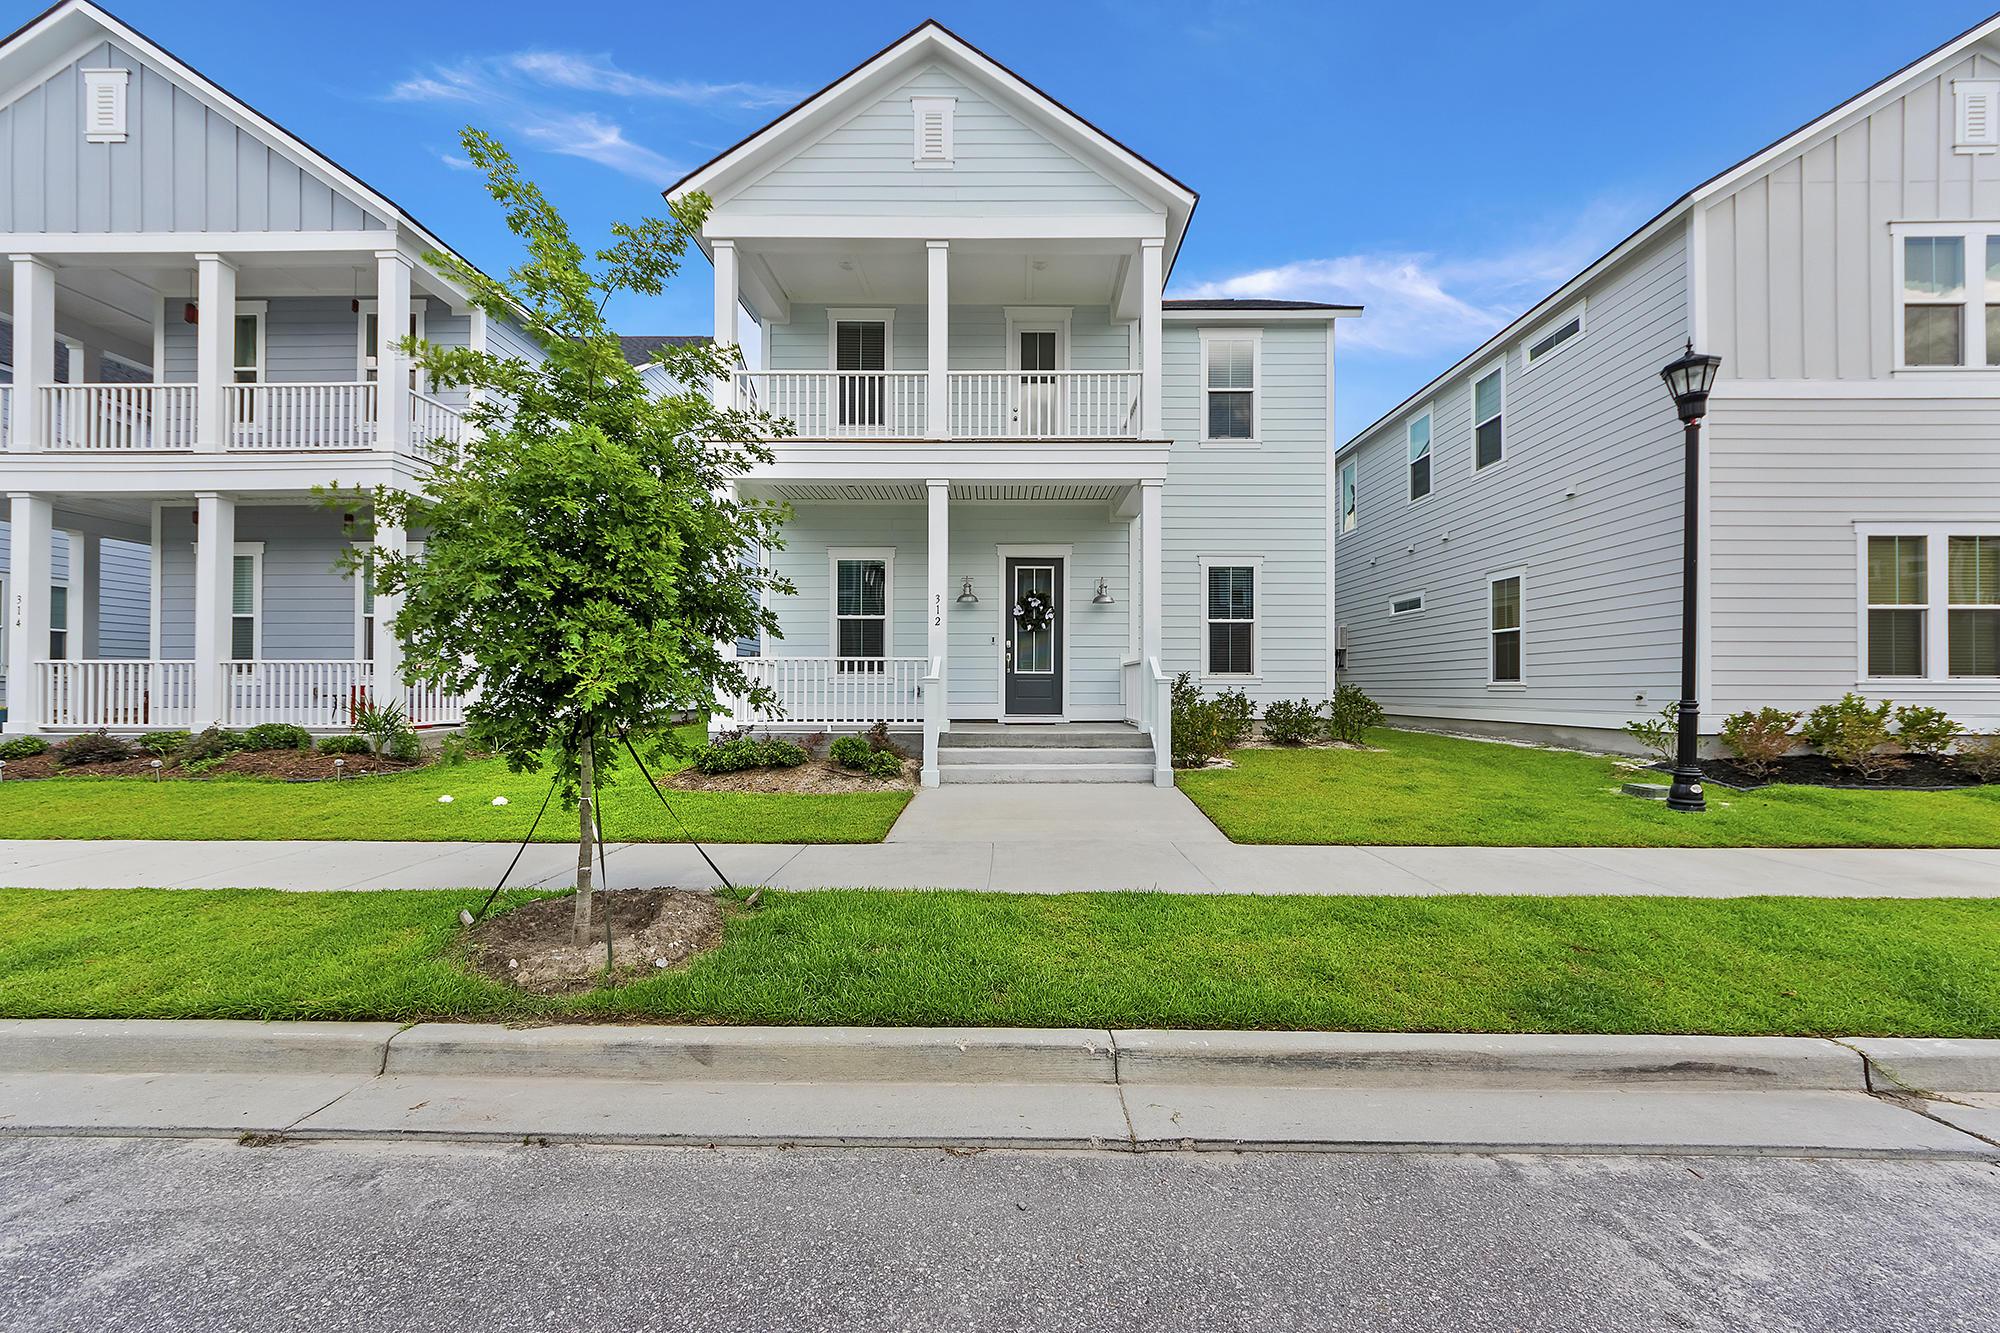 312 Cypress Knee Lndg Summerville, SC 29483